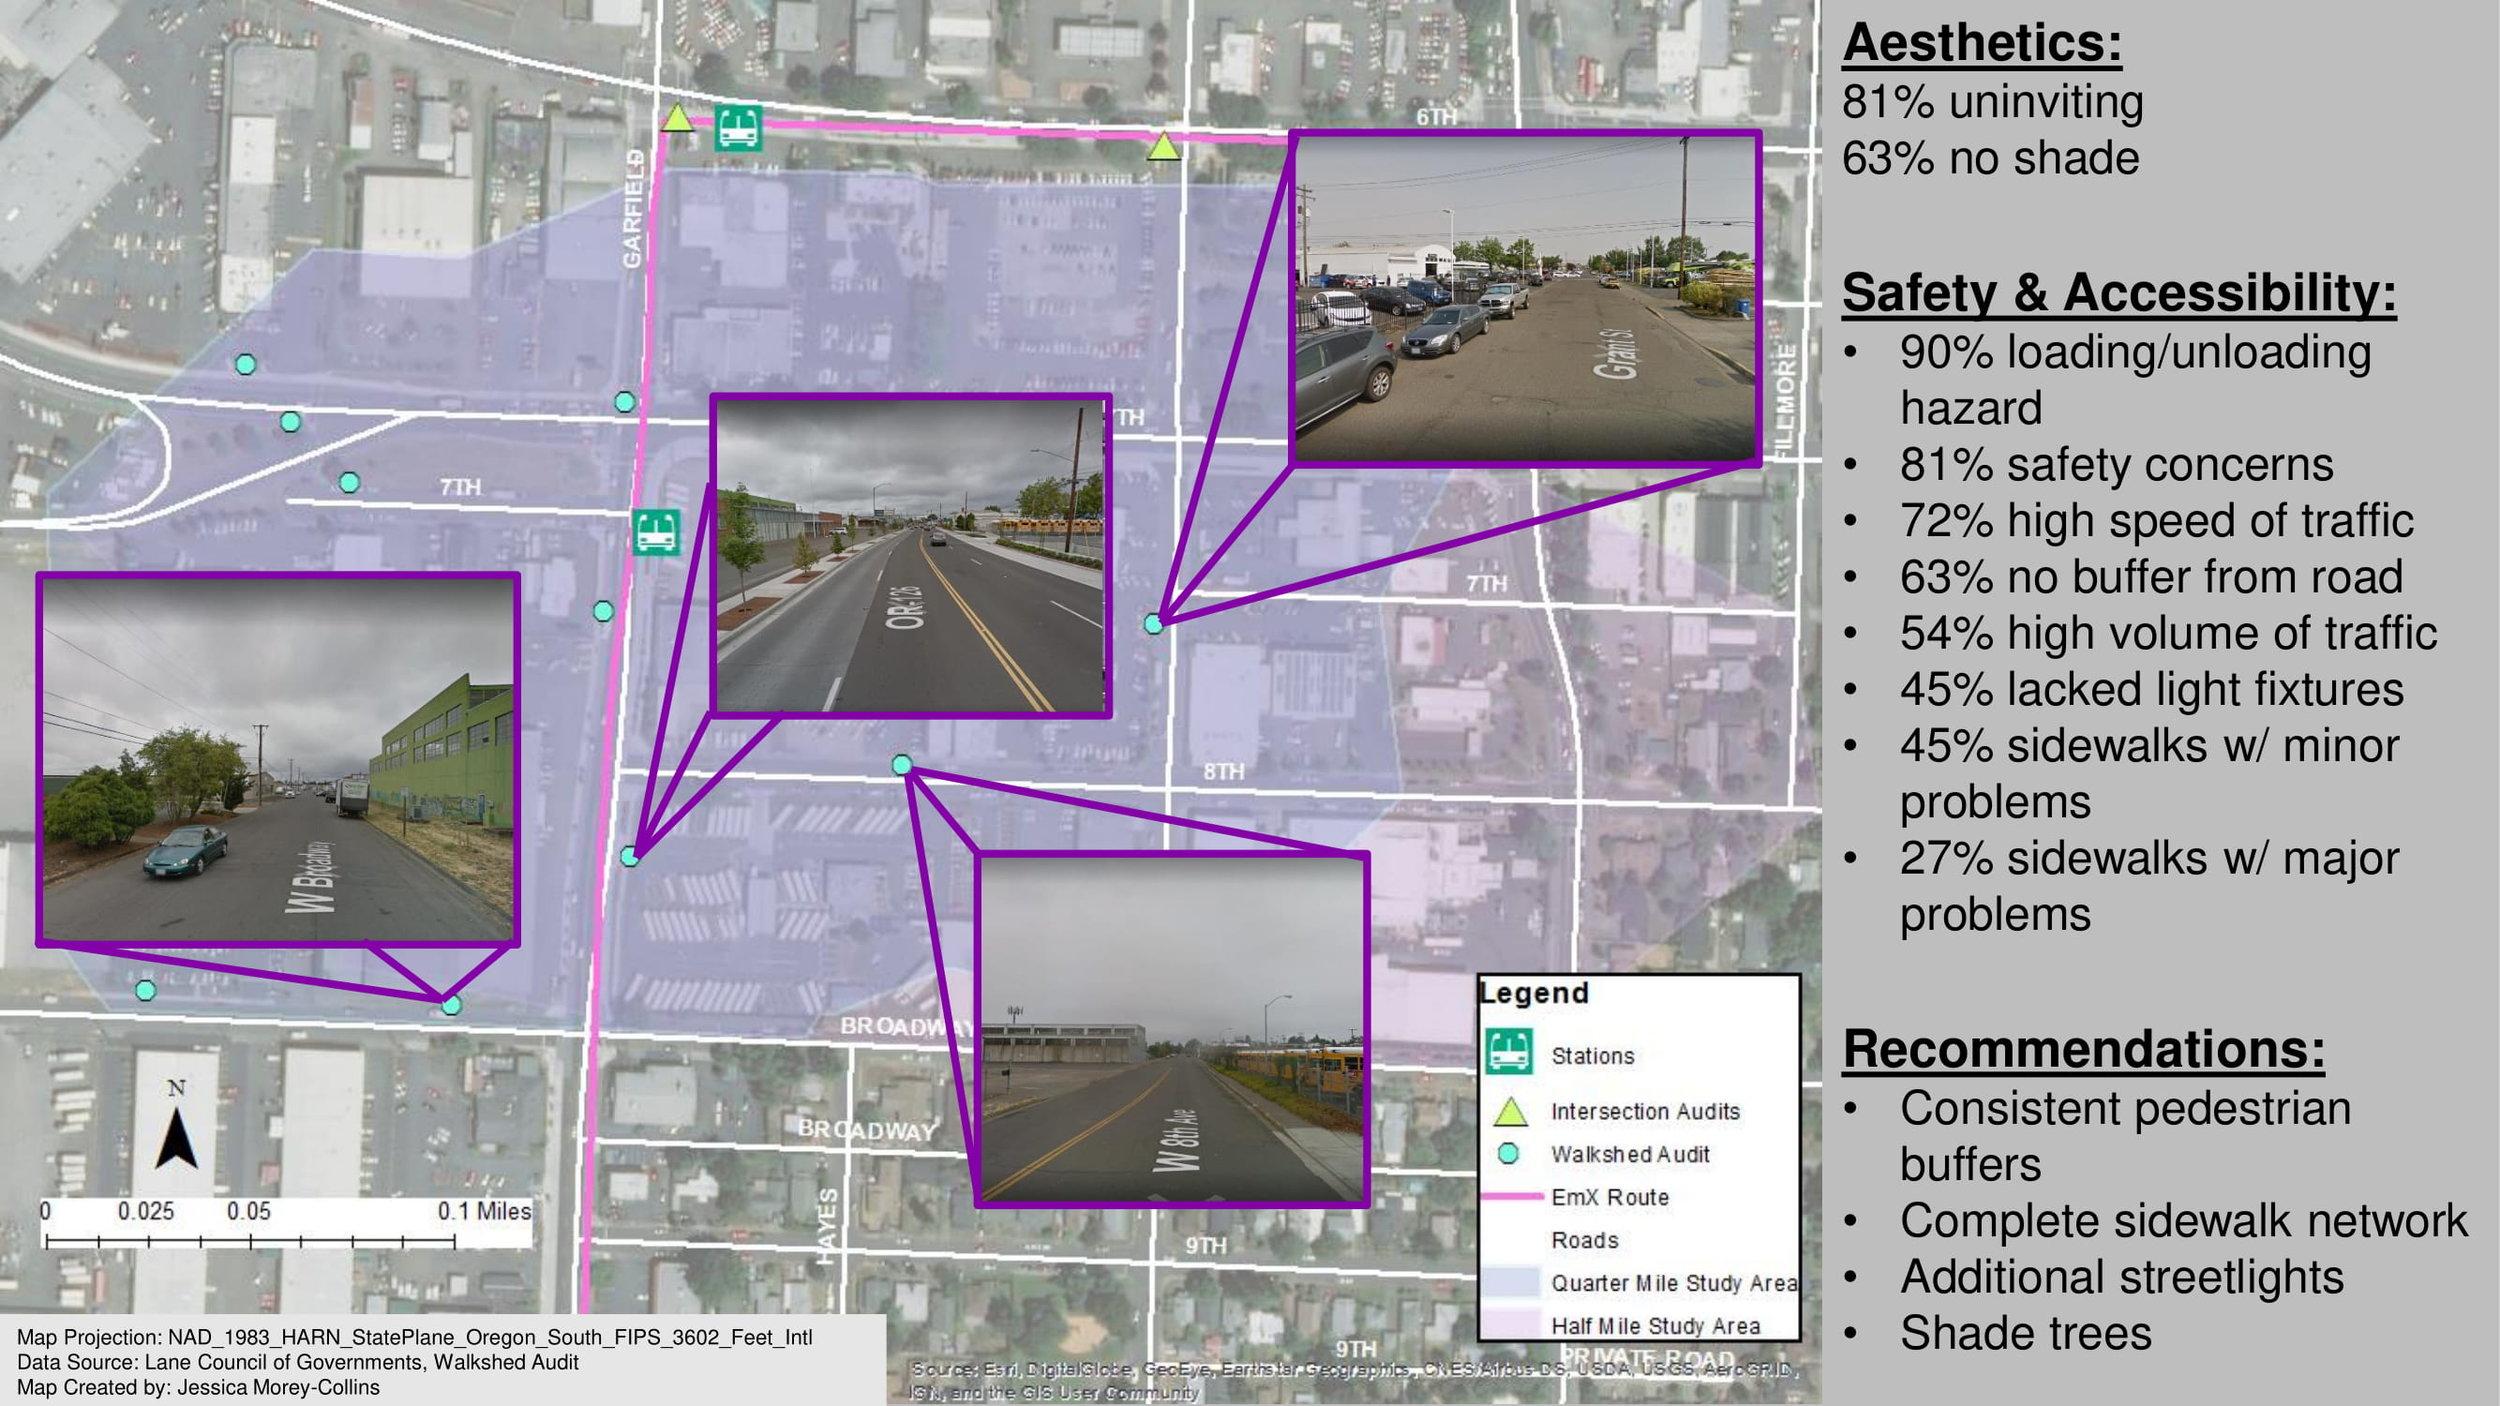 Walkshed audit for environmental analysis of a new public transportation line in Eugene, Oregon.